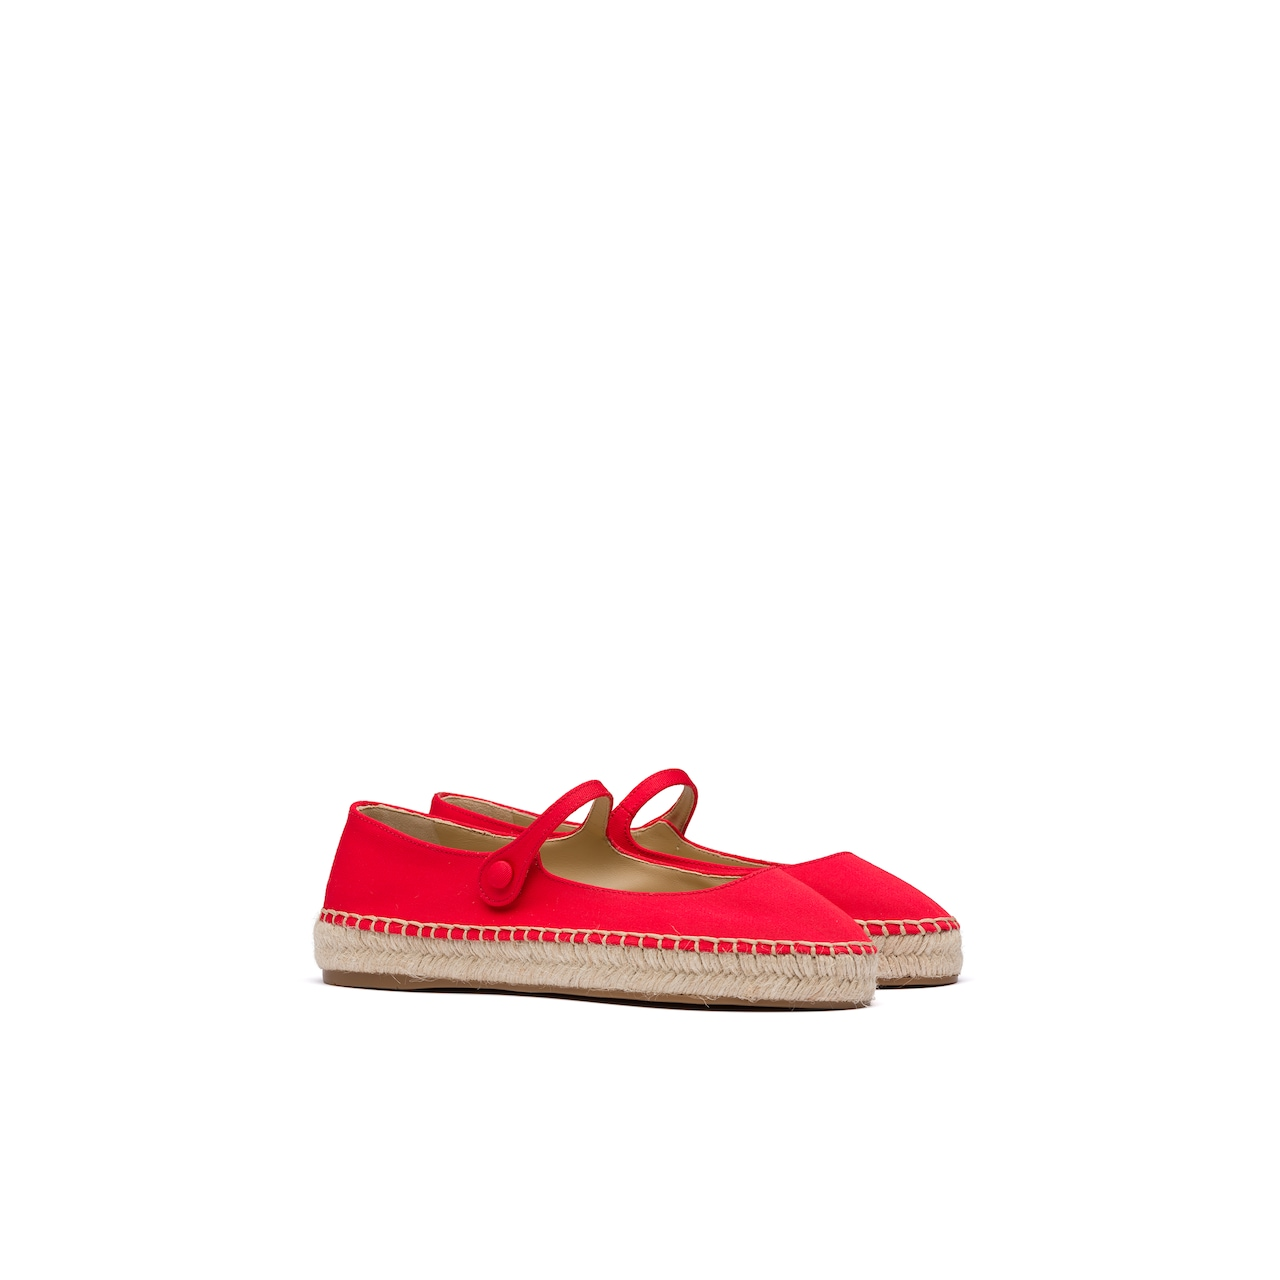 Prada 华达呢芭蕾平底鞋 1